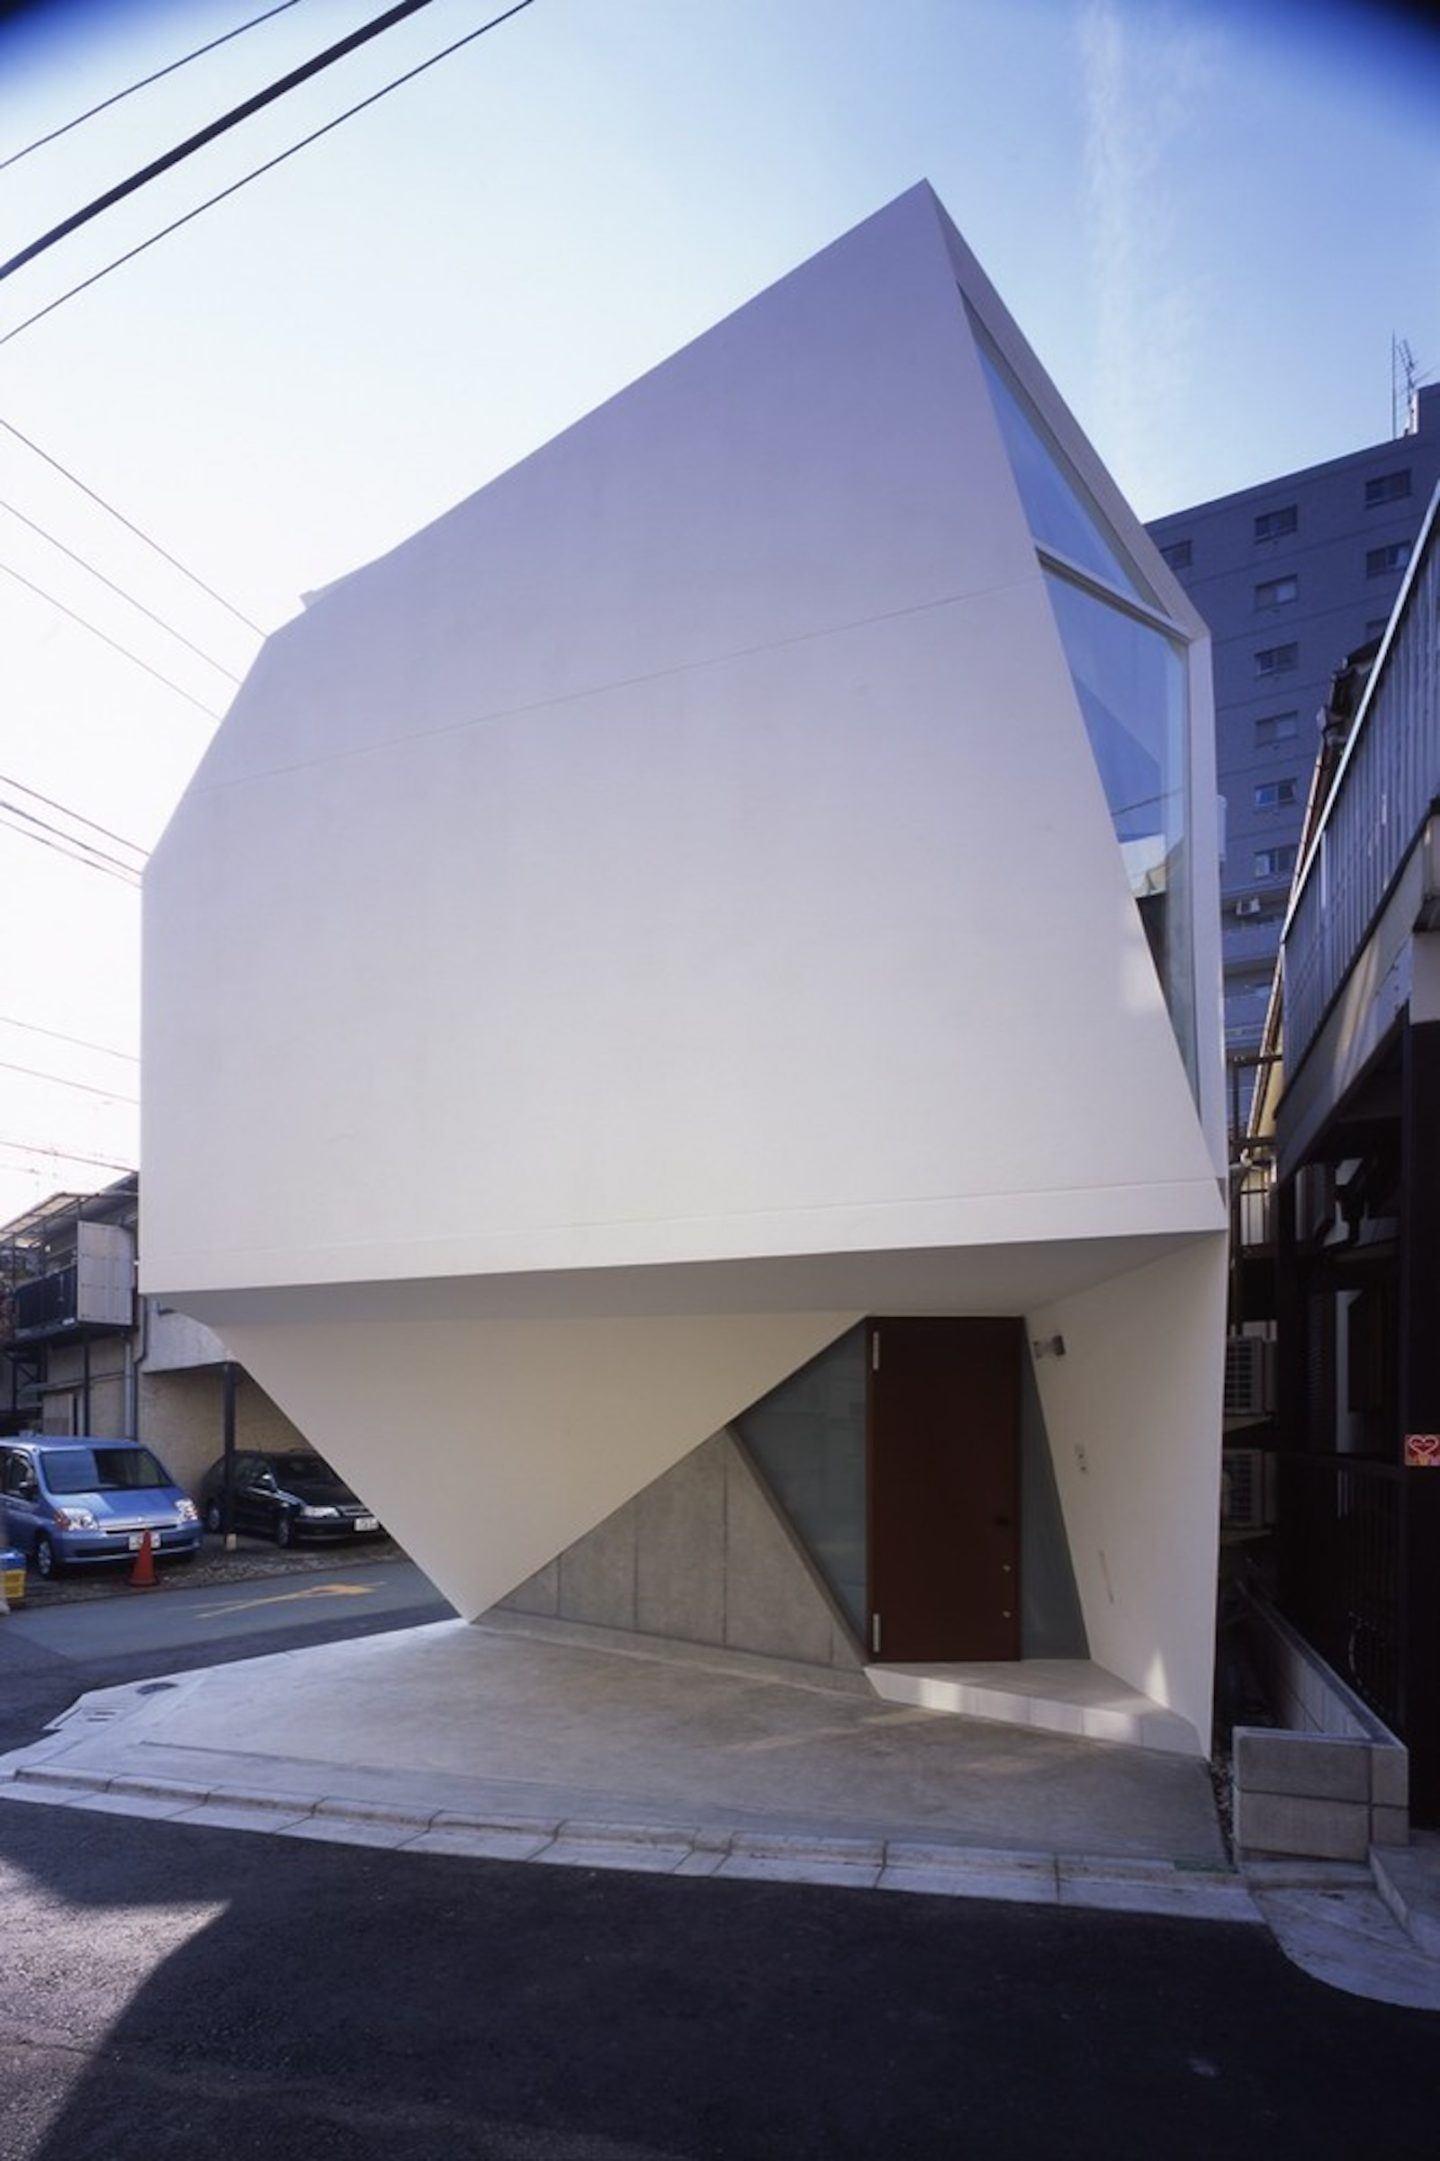 IGNANT-Architecture-Atelier-Tekuto-Reflection-Of-Mineral-004